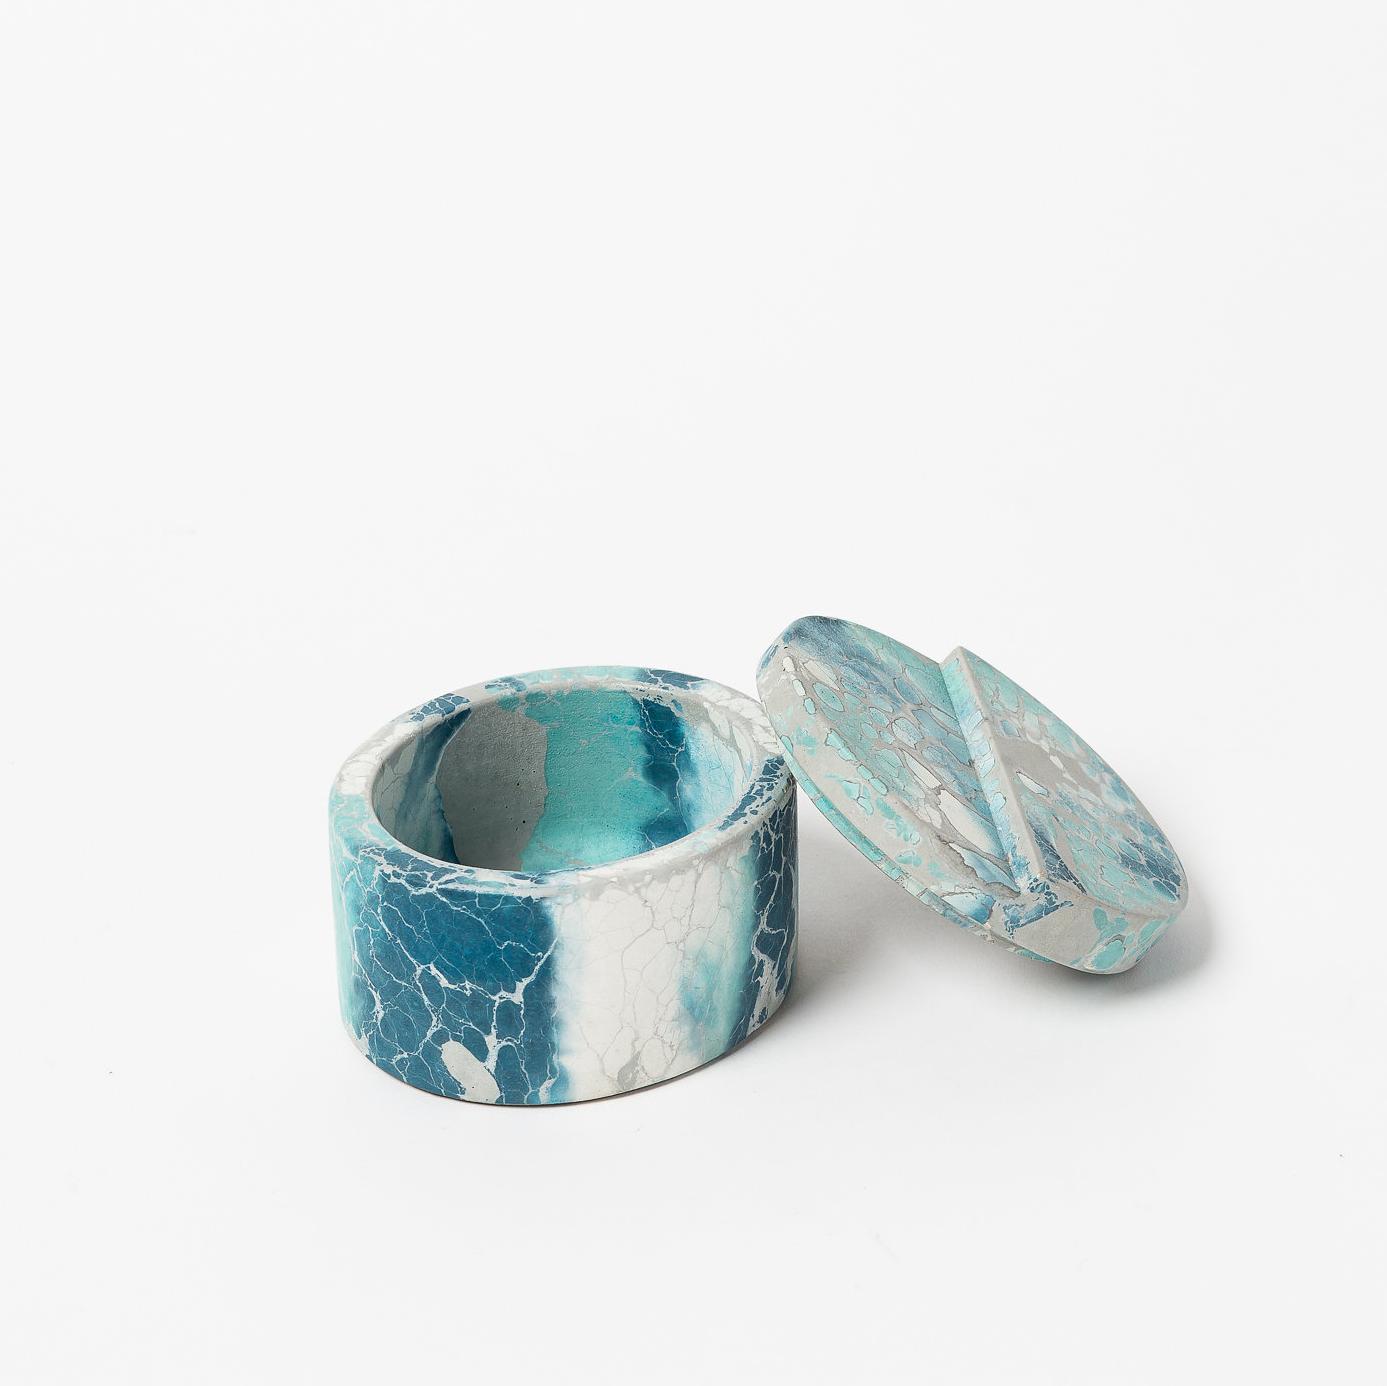 "BLUE & GRAY CONCRETE BOX  4"" D x 2.5"" H  Blue and gray concrete"